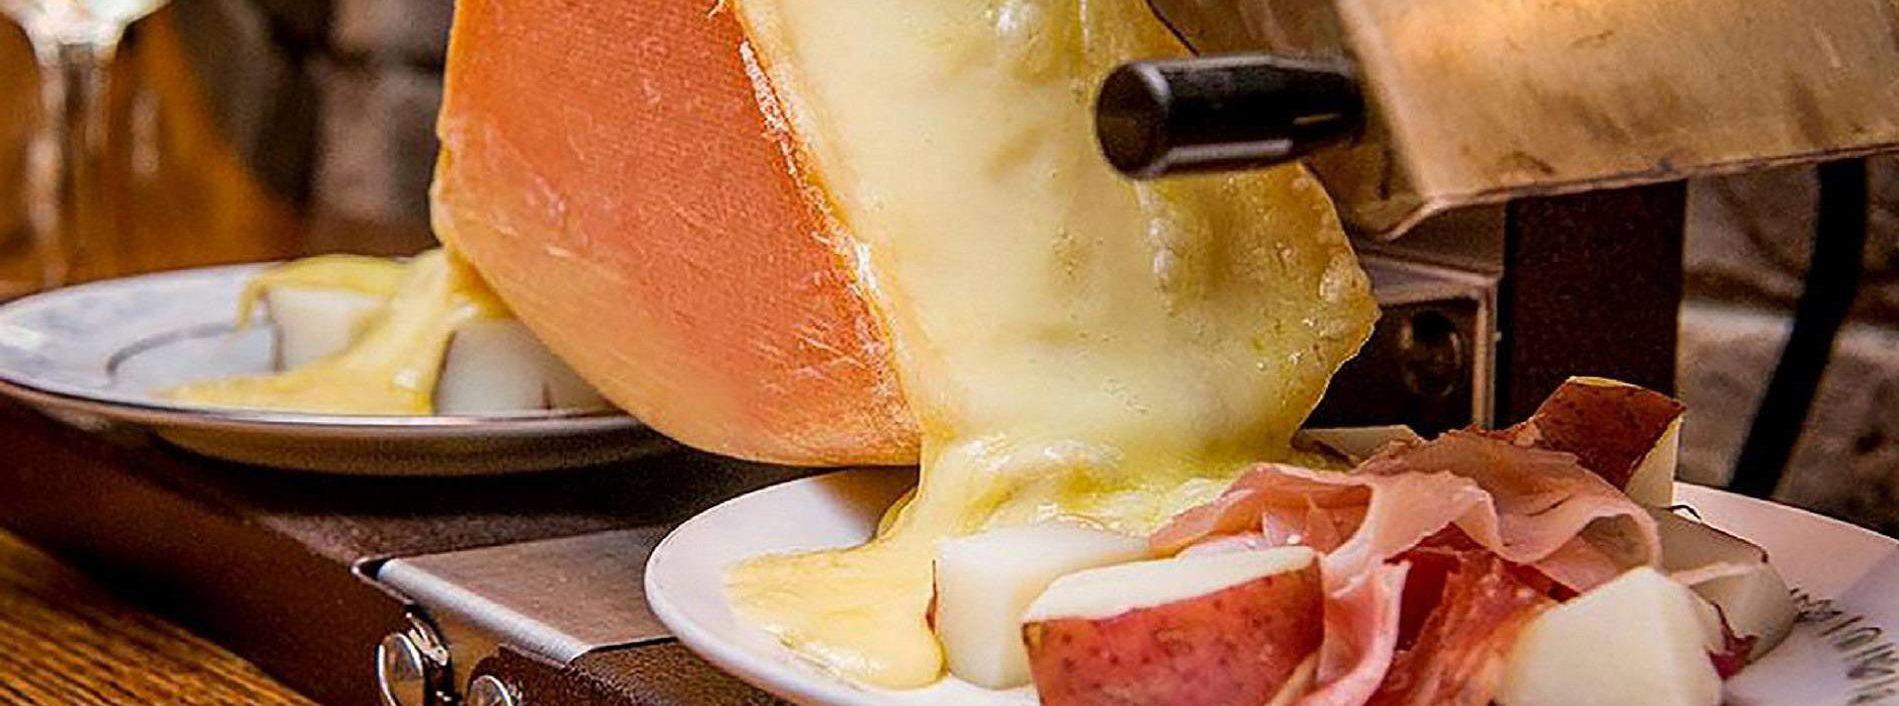 Soirée Raclette au restaurant l'Auberge a Chambesy